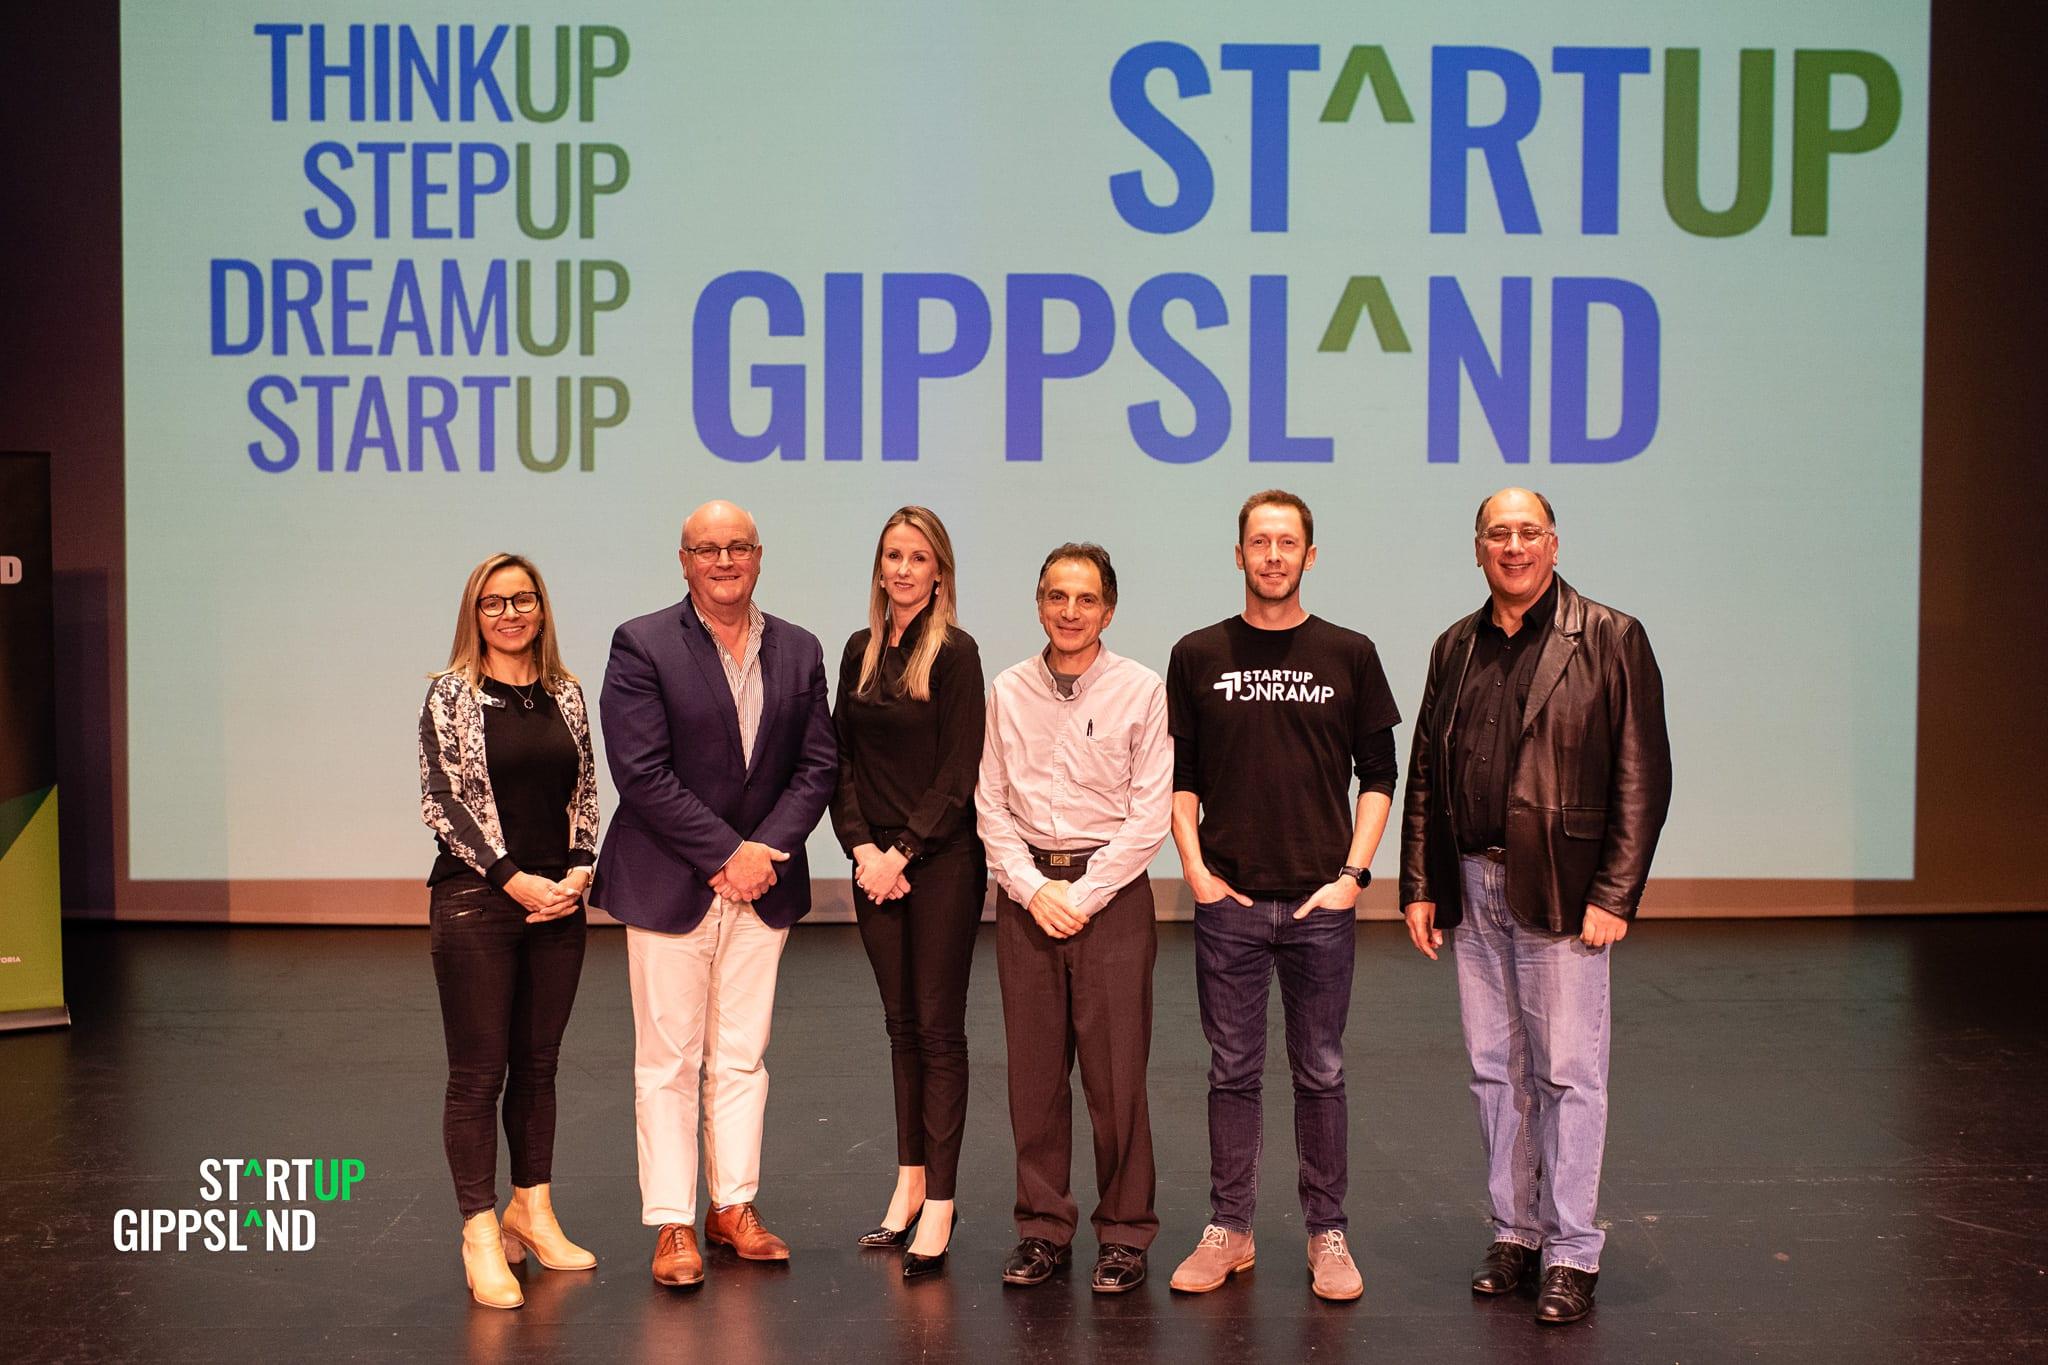 Startup Gippsland Showcase judges